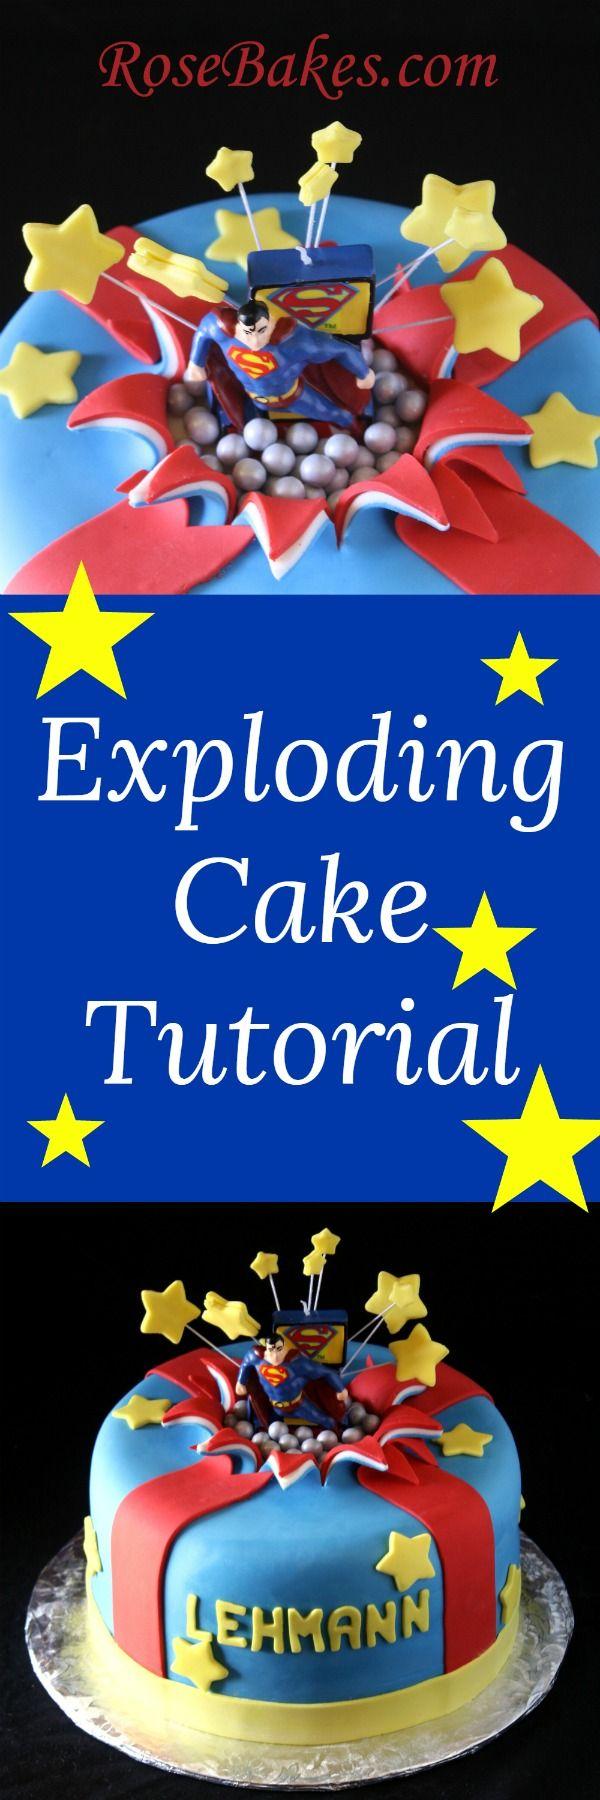 Exploding Cake Tutorial